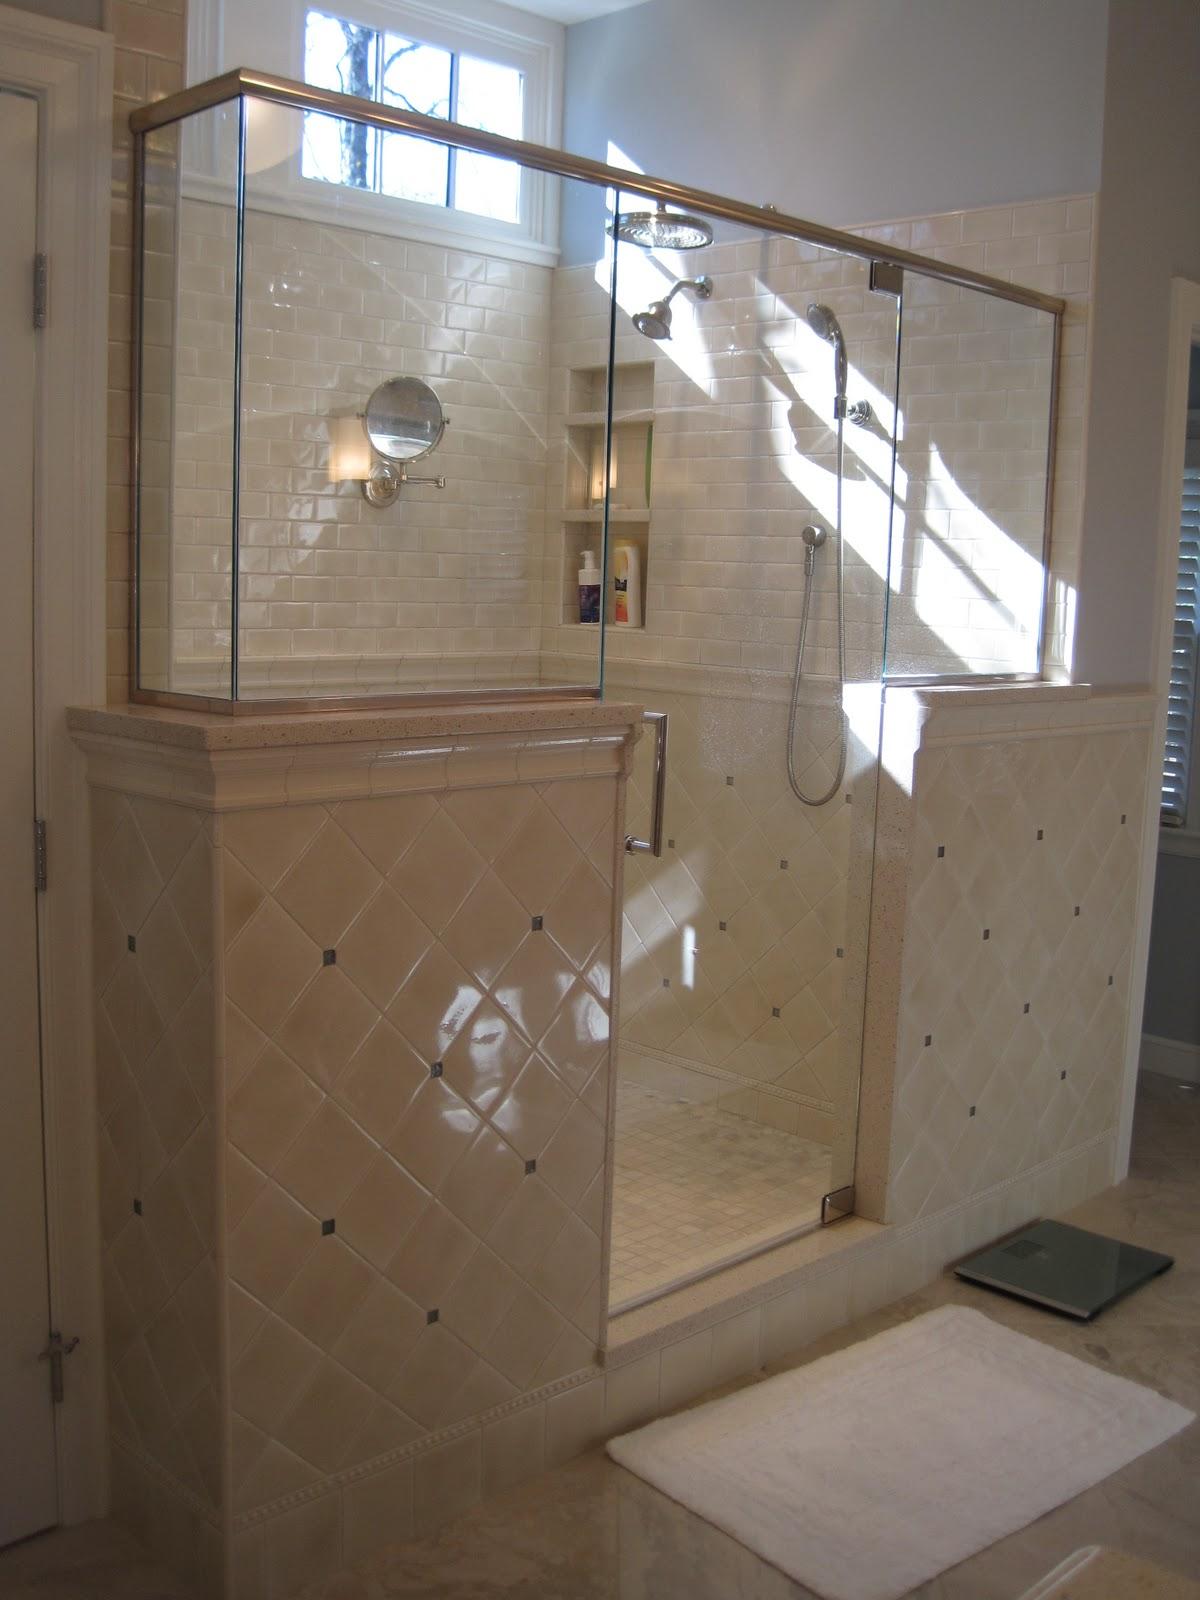 Alexi bebezas master suite bath addition over garage for Garages in bath